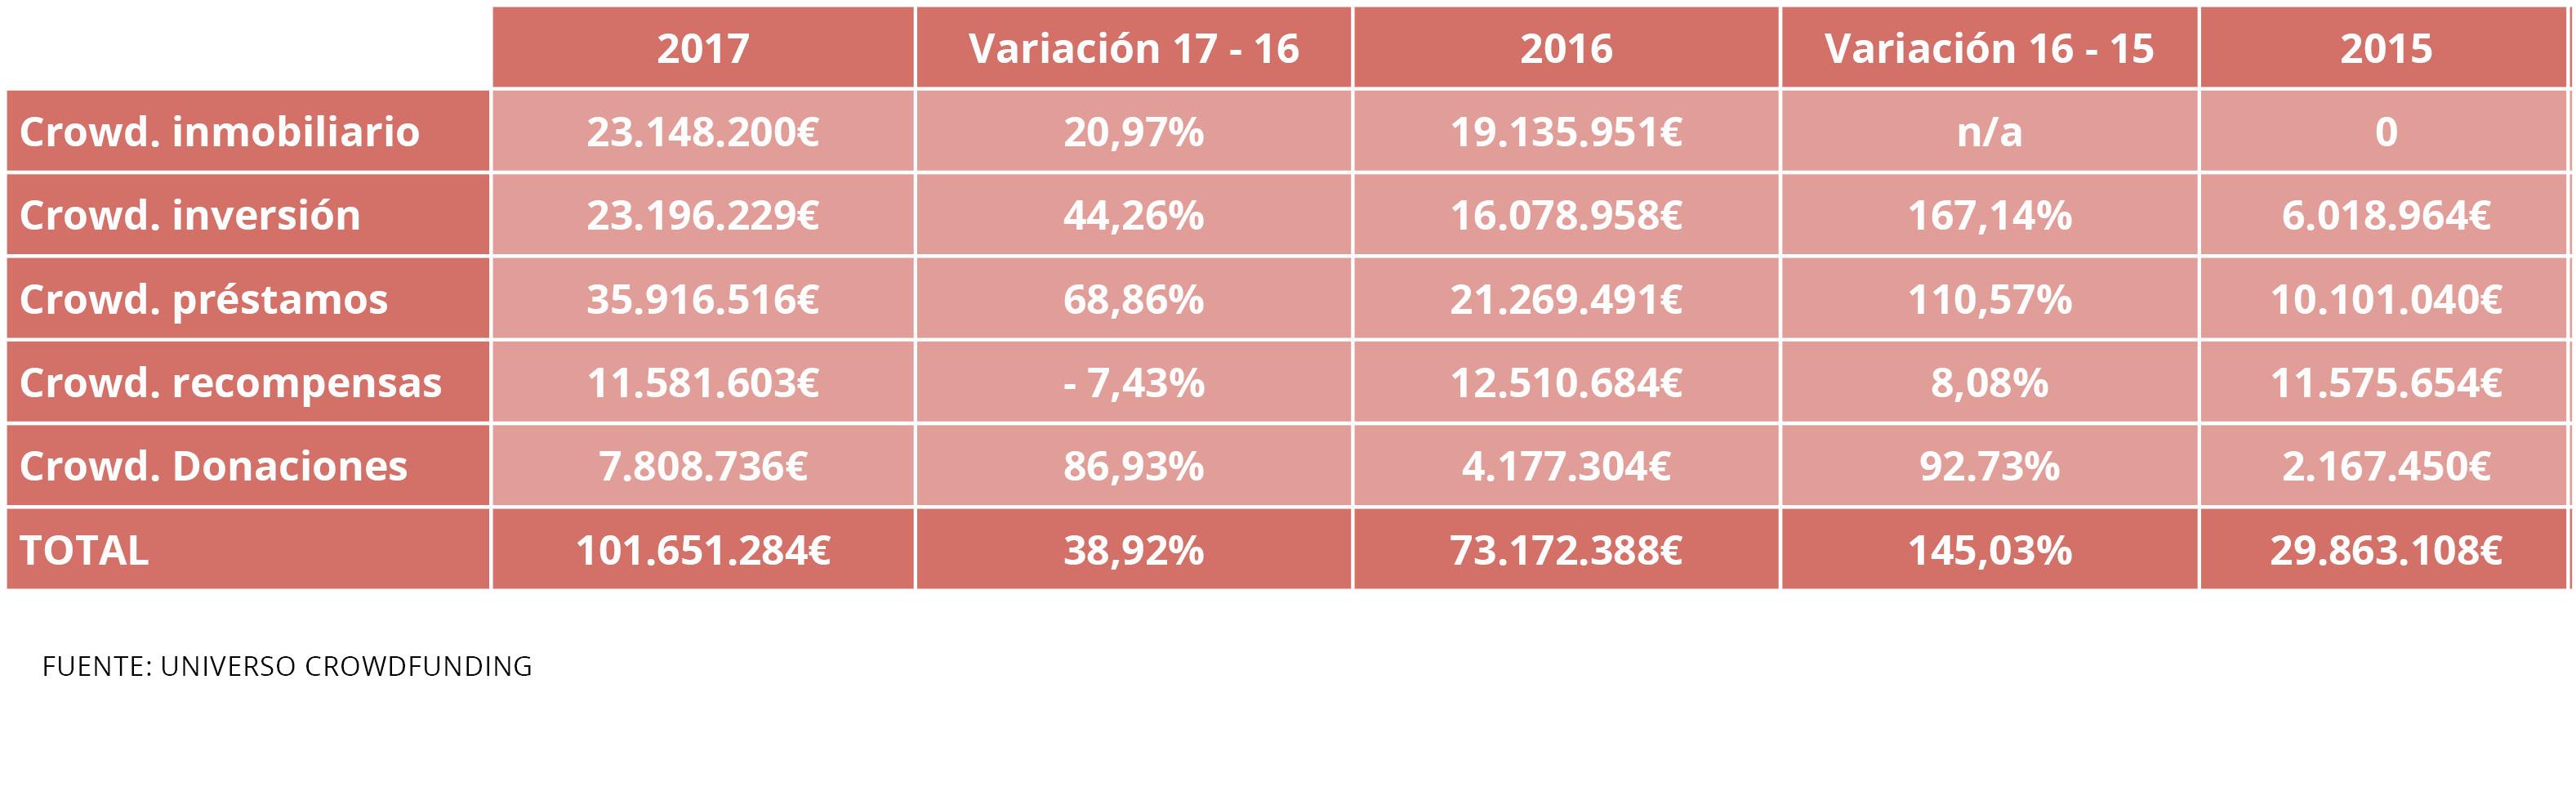 tabla recaudacion crowdfunding en España Housers